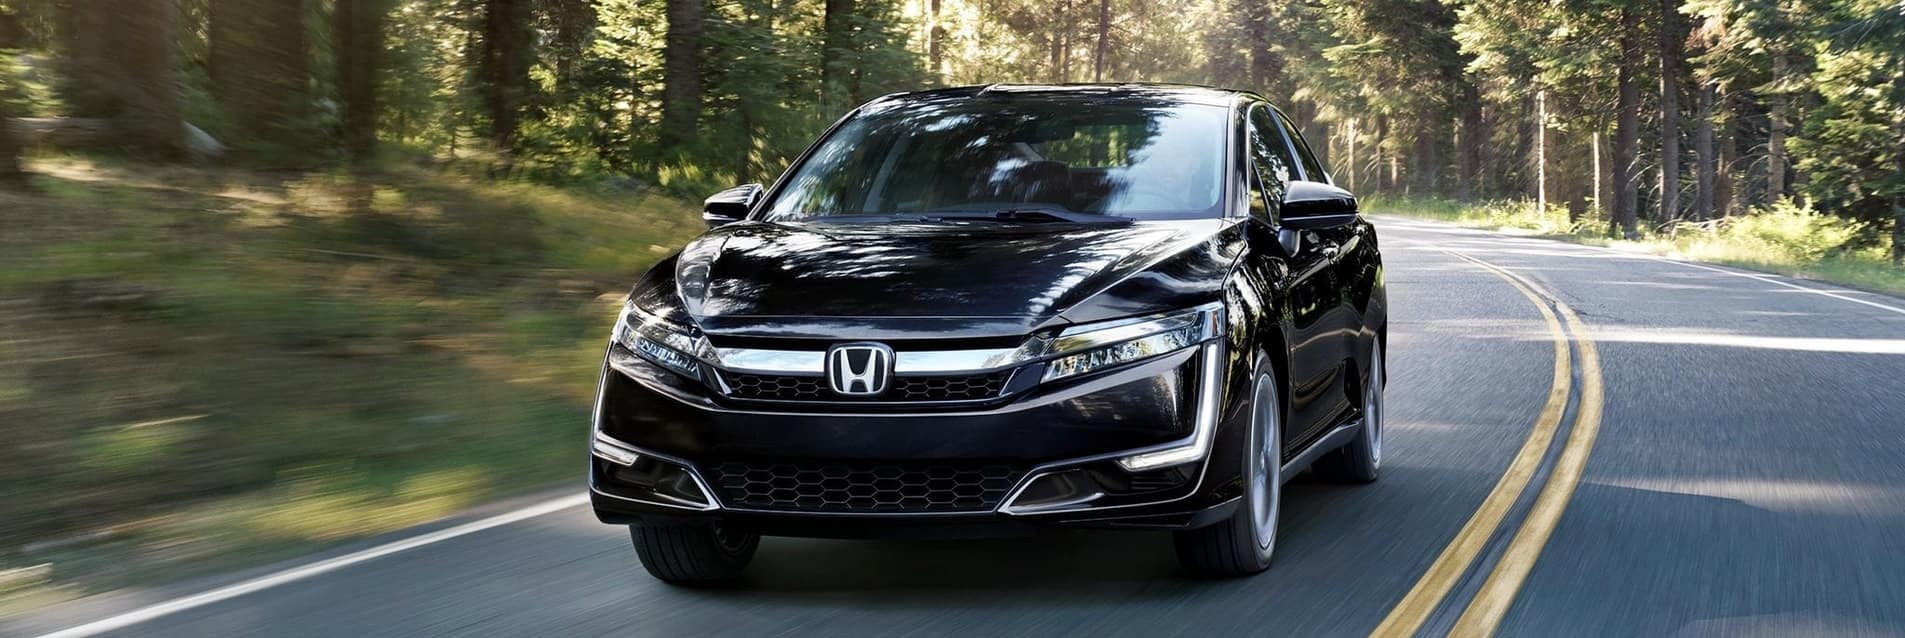 Award Winning Environmentally Friendly Honda Vehicles